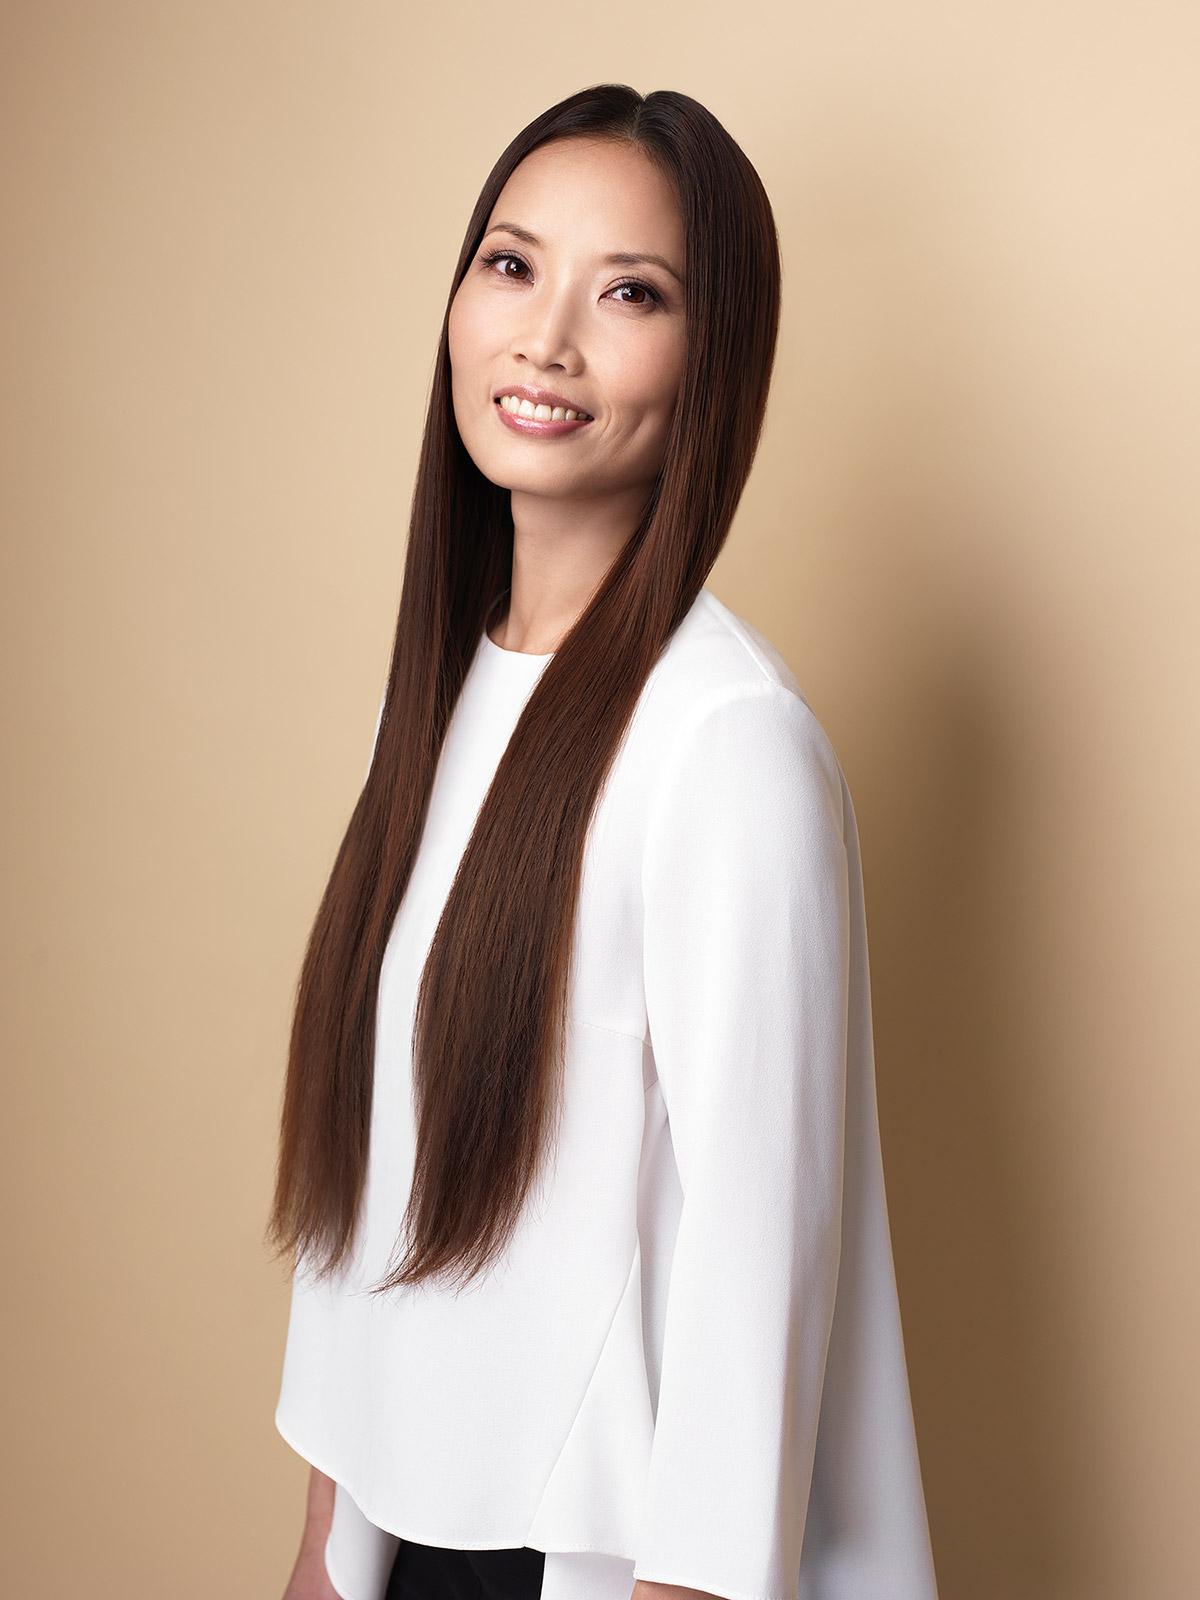 Джу Юн Бэ, артистка балета Большого театра. Фотограф: Александр Сакулин